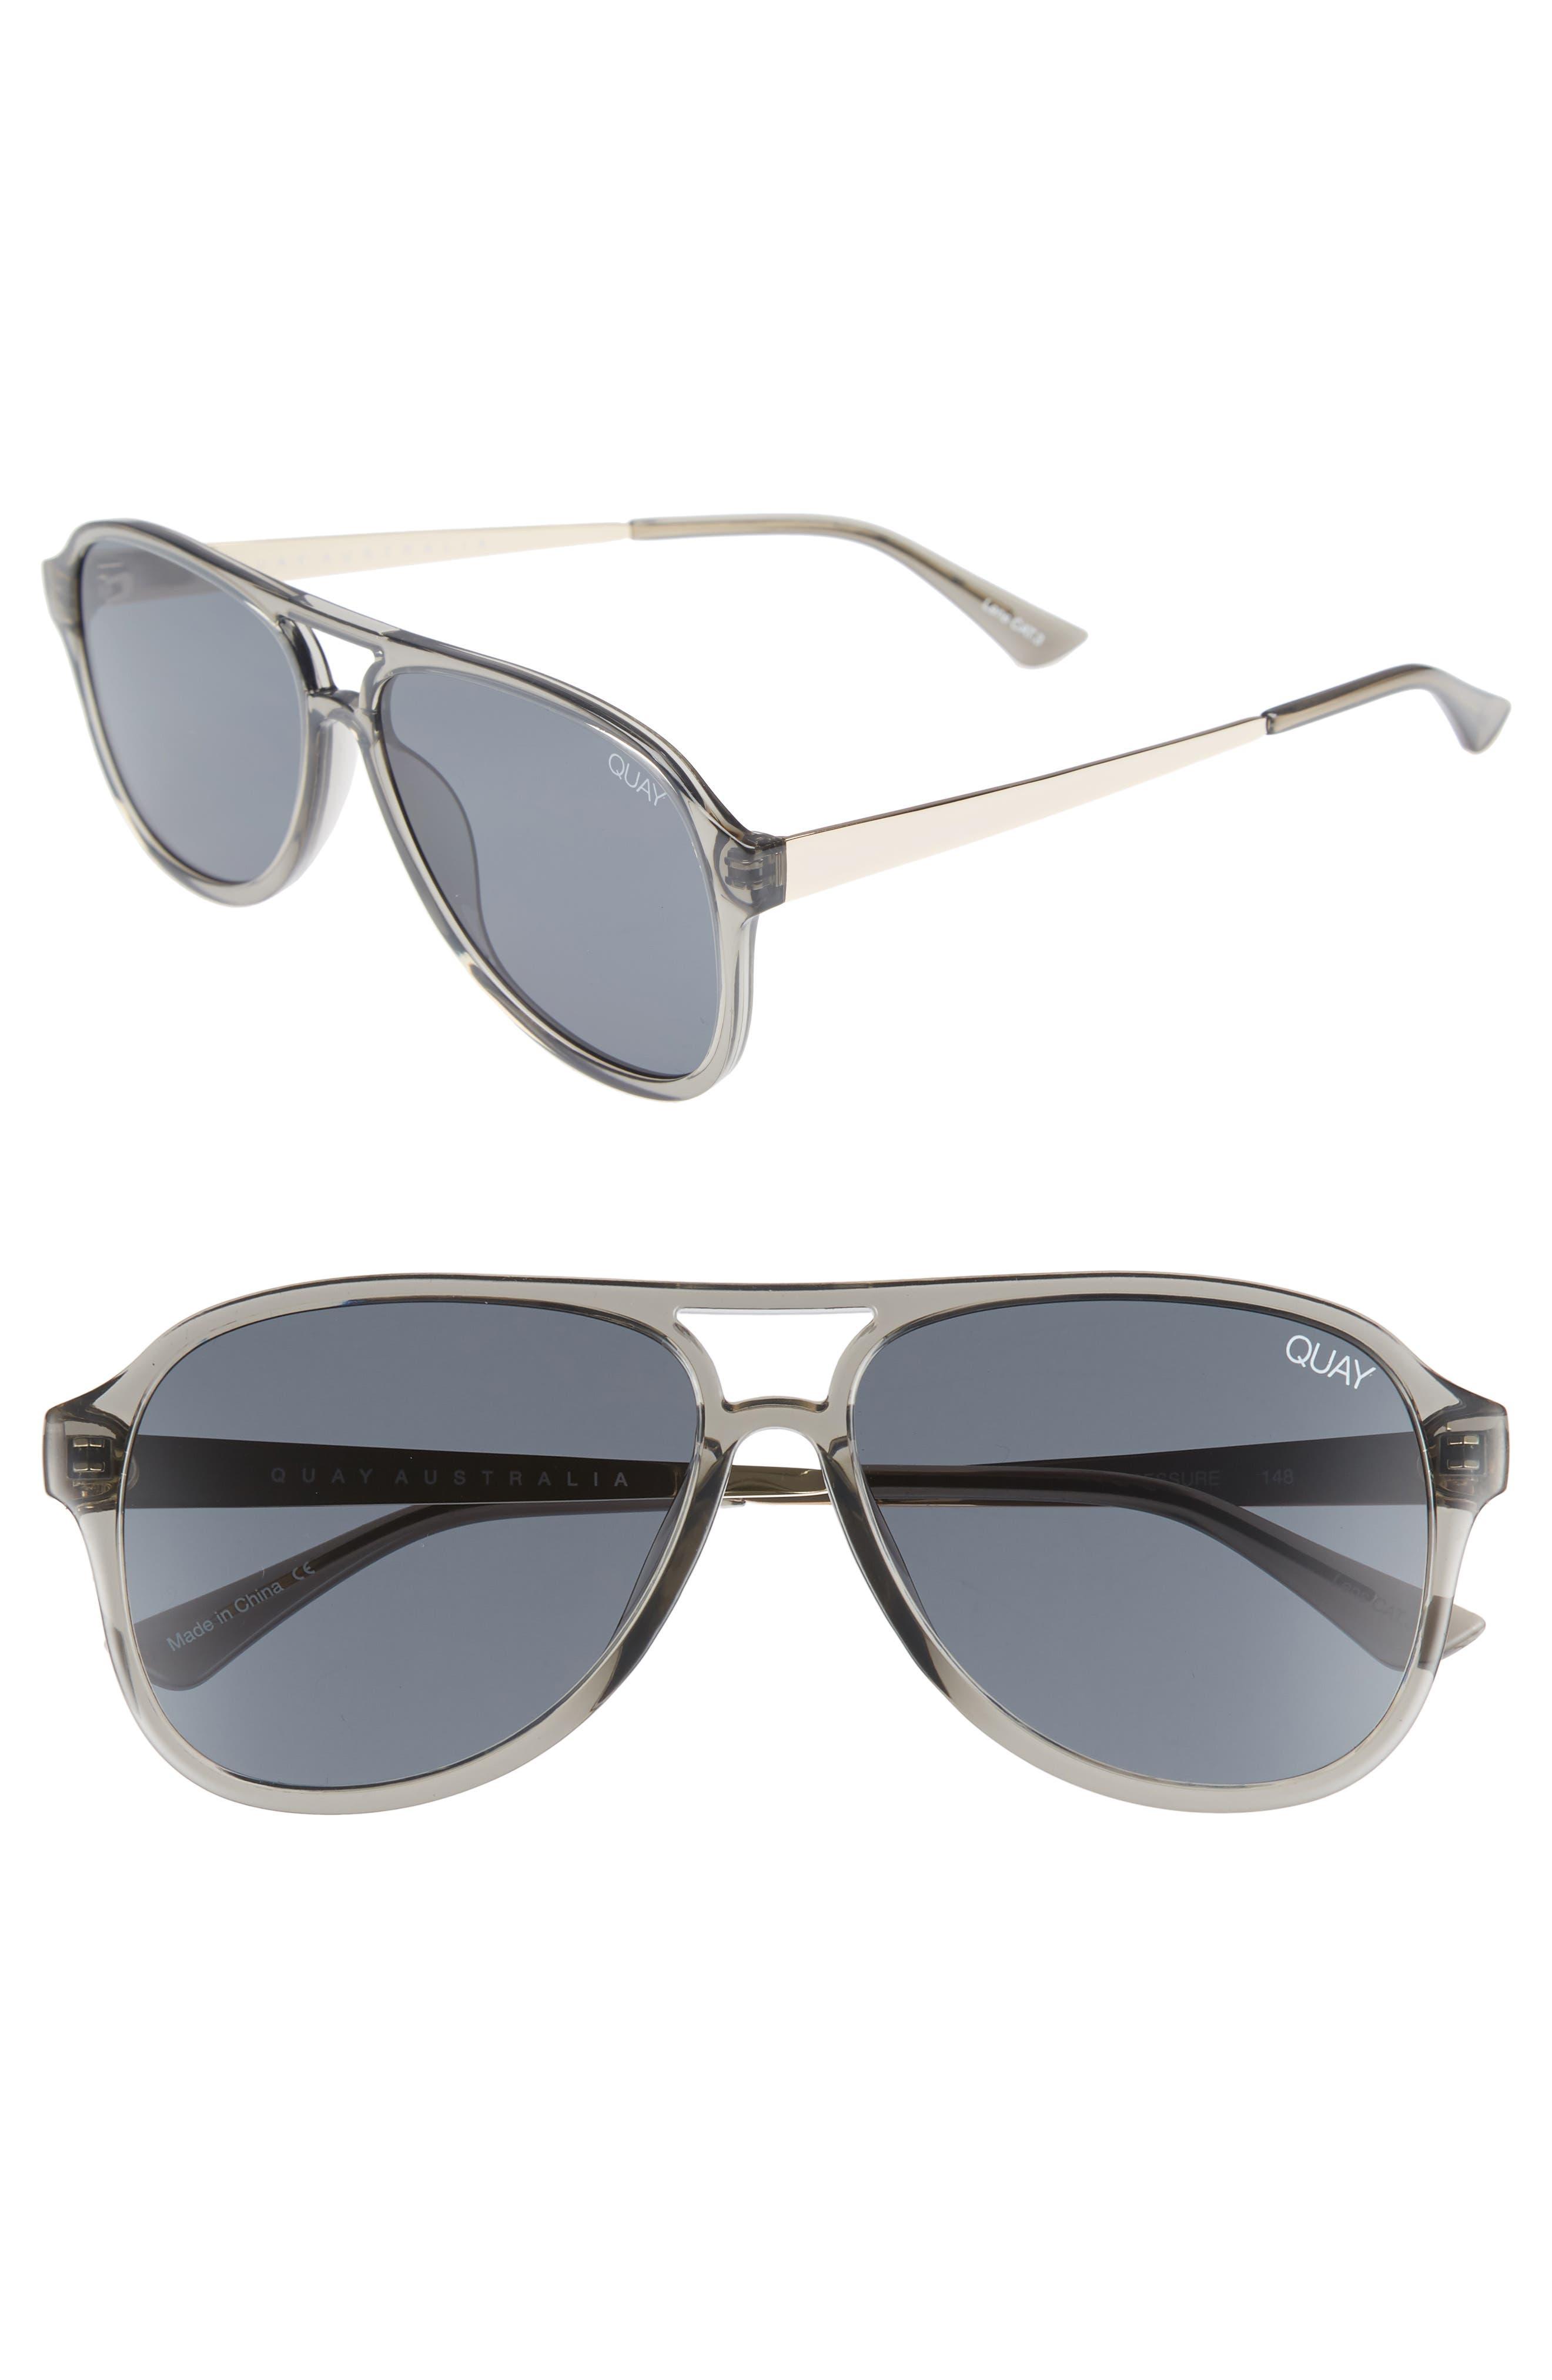 Quay Australia Under Pressure 5m Aviator Sunglasses - Grey/ Smoke